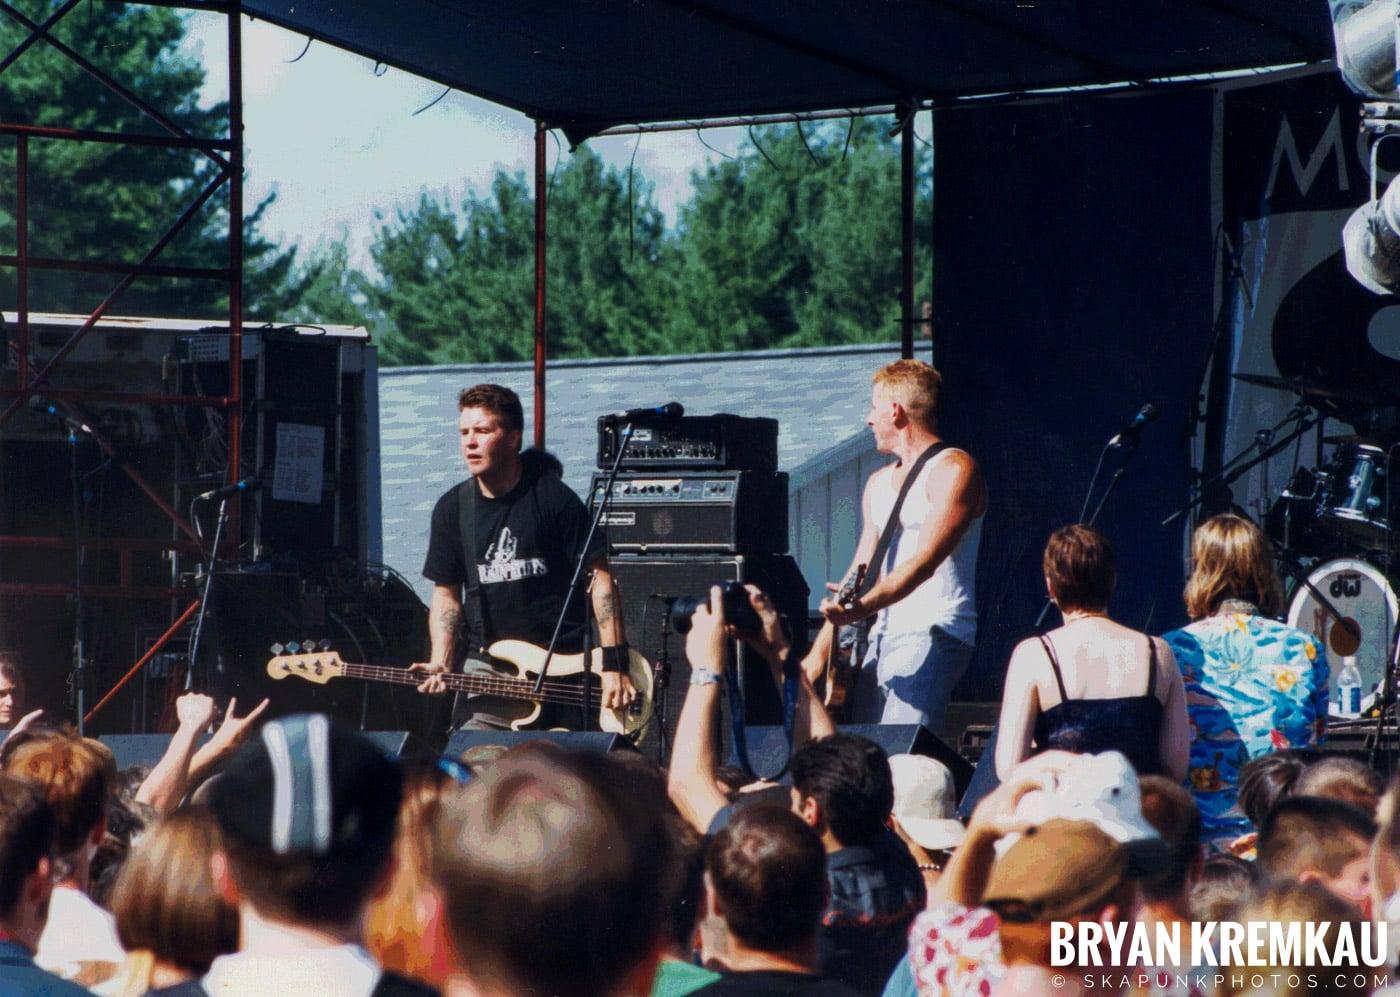 The Dropkick Murphys @ New England Ska Fest 98, Westford, MA - 8.22.98 (4)